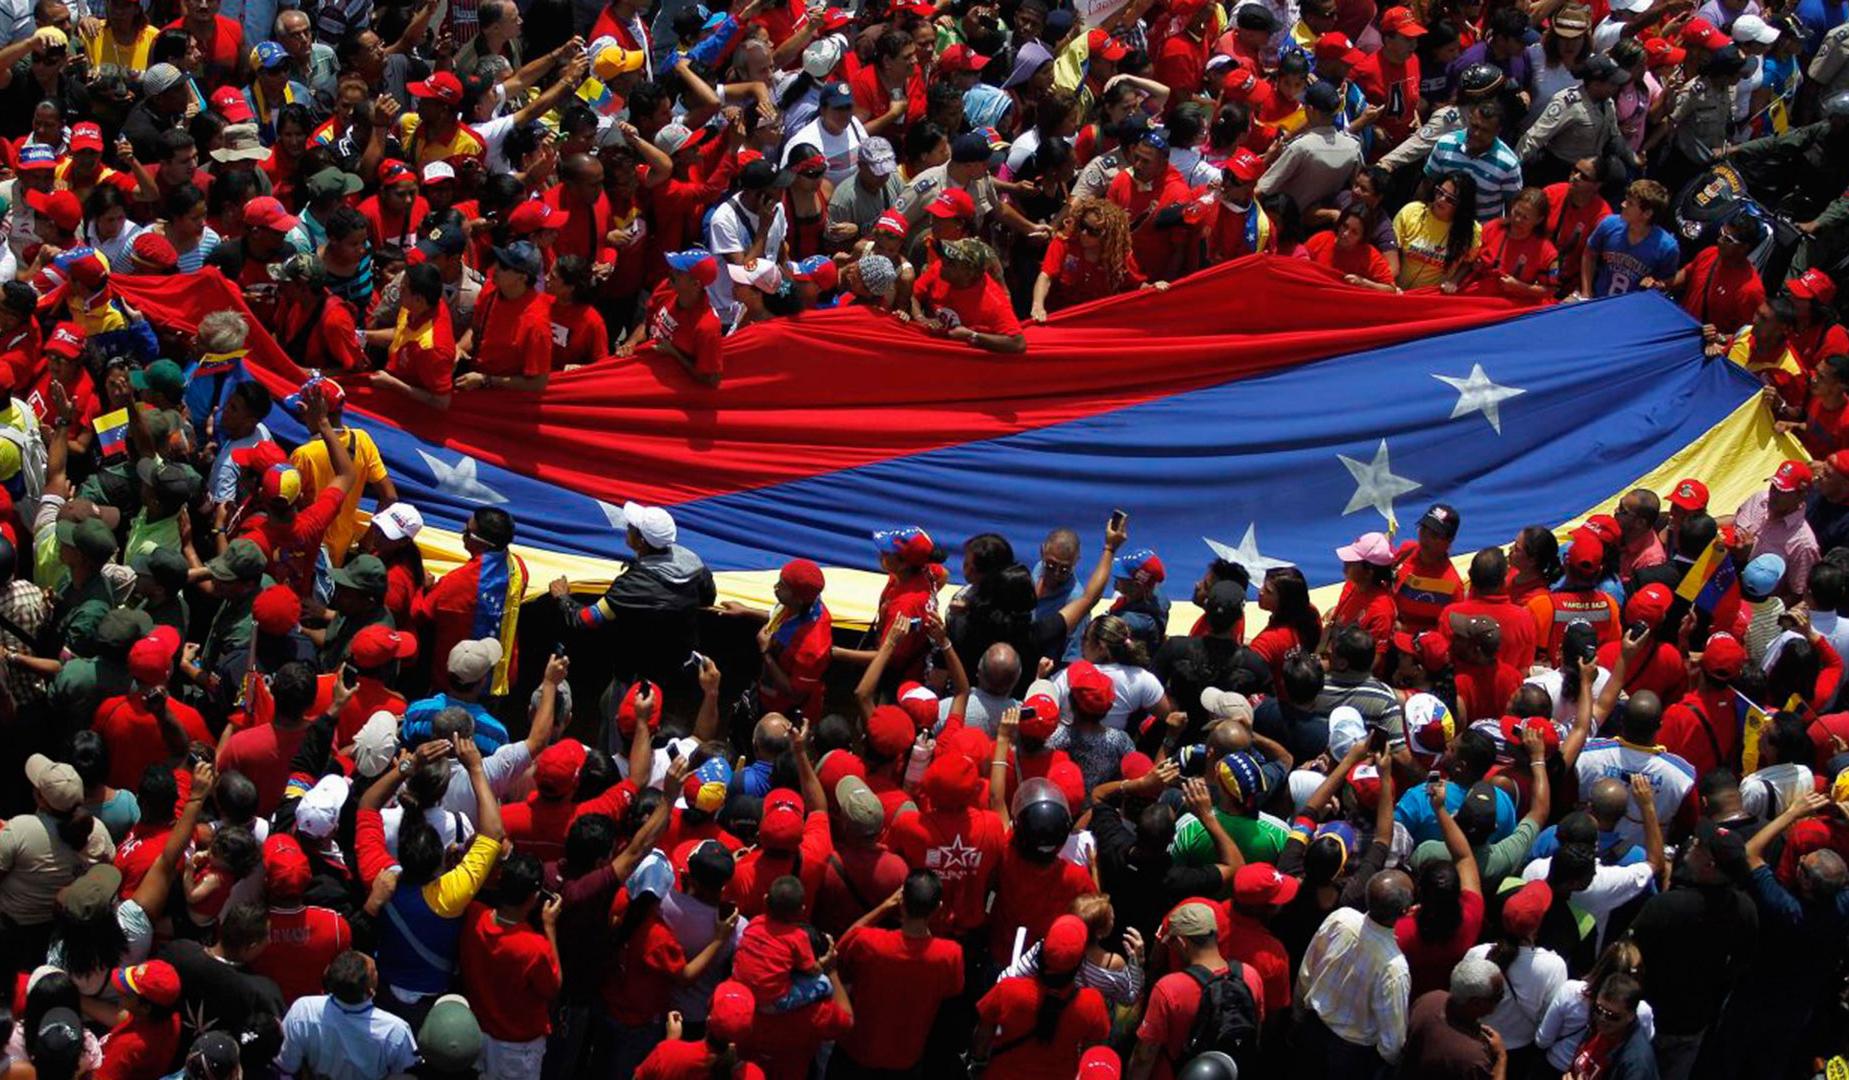 20130308_manifestacao_solidariedade_funeral_hugo_chavez_caracas_venezuela_bandeira_venezuelana-1